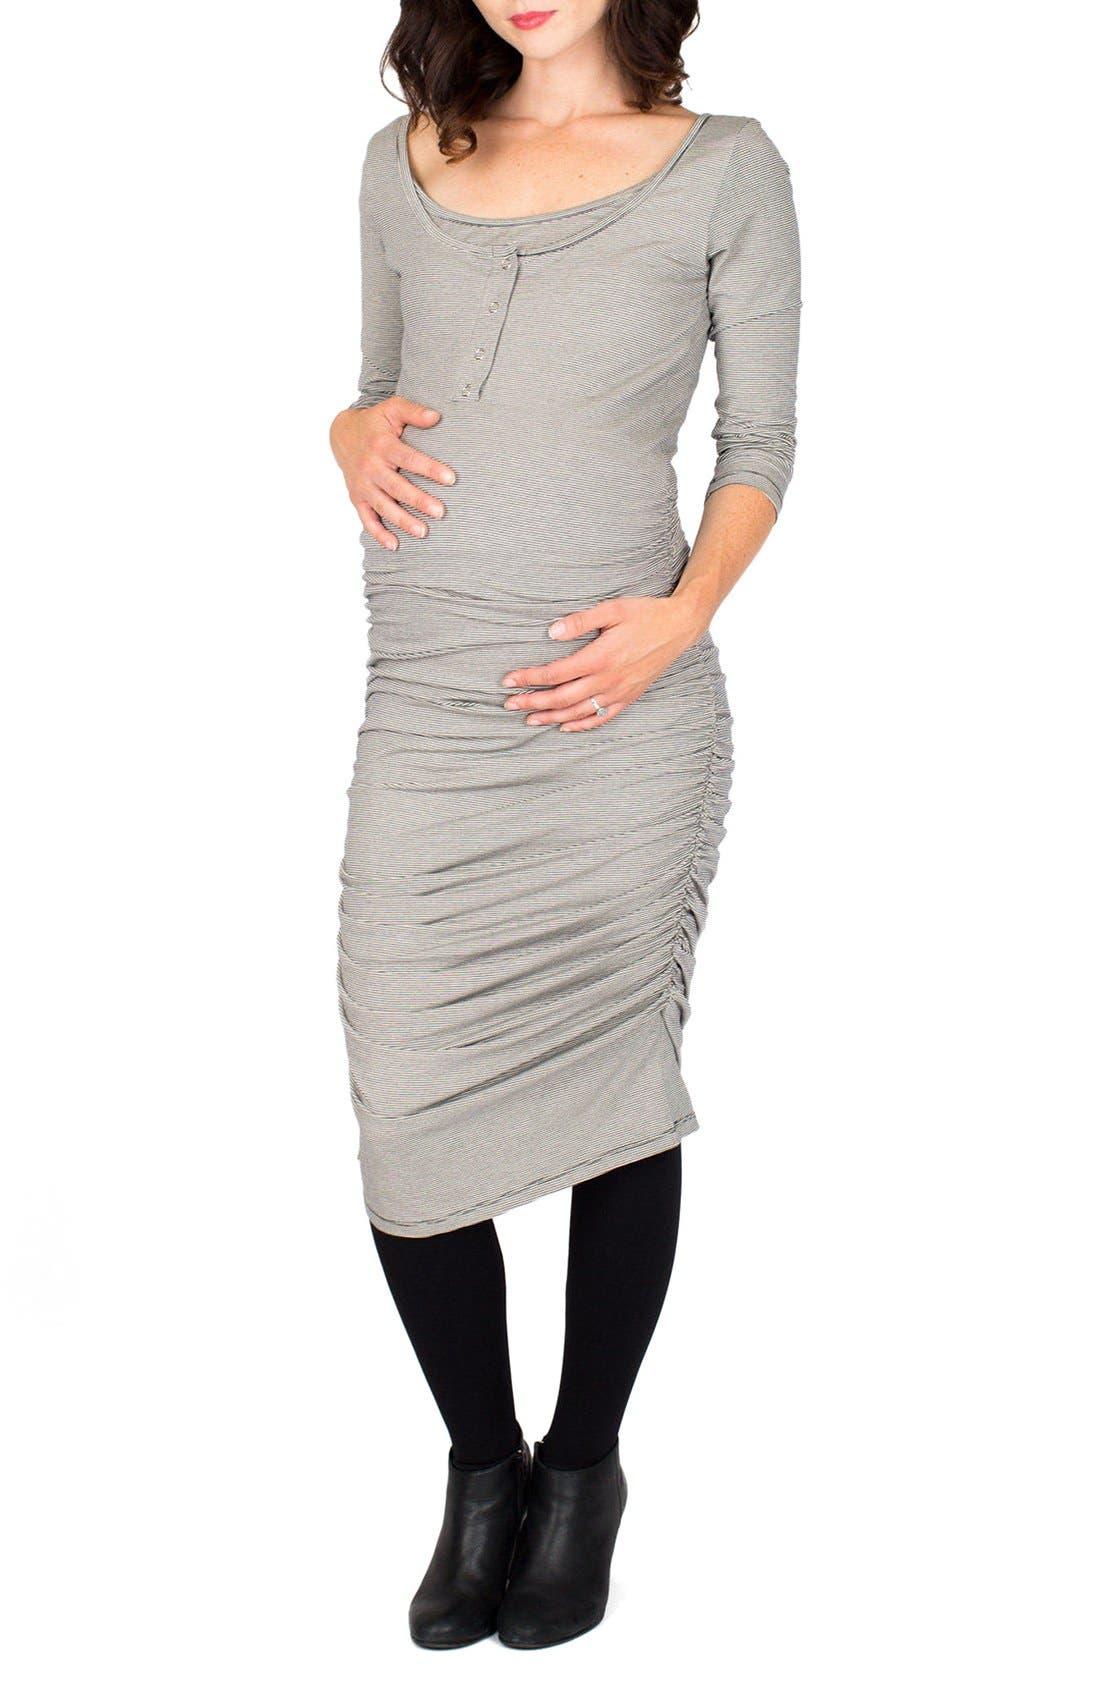 Nom Henley Maternity Dress,                             Main thumbnail 1, color,                             CHARCOAL MICROSTRIPE